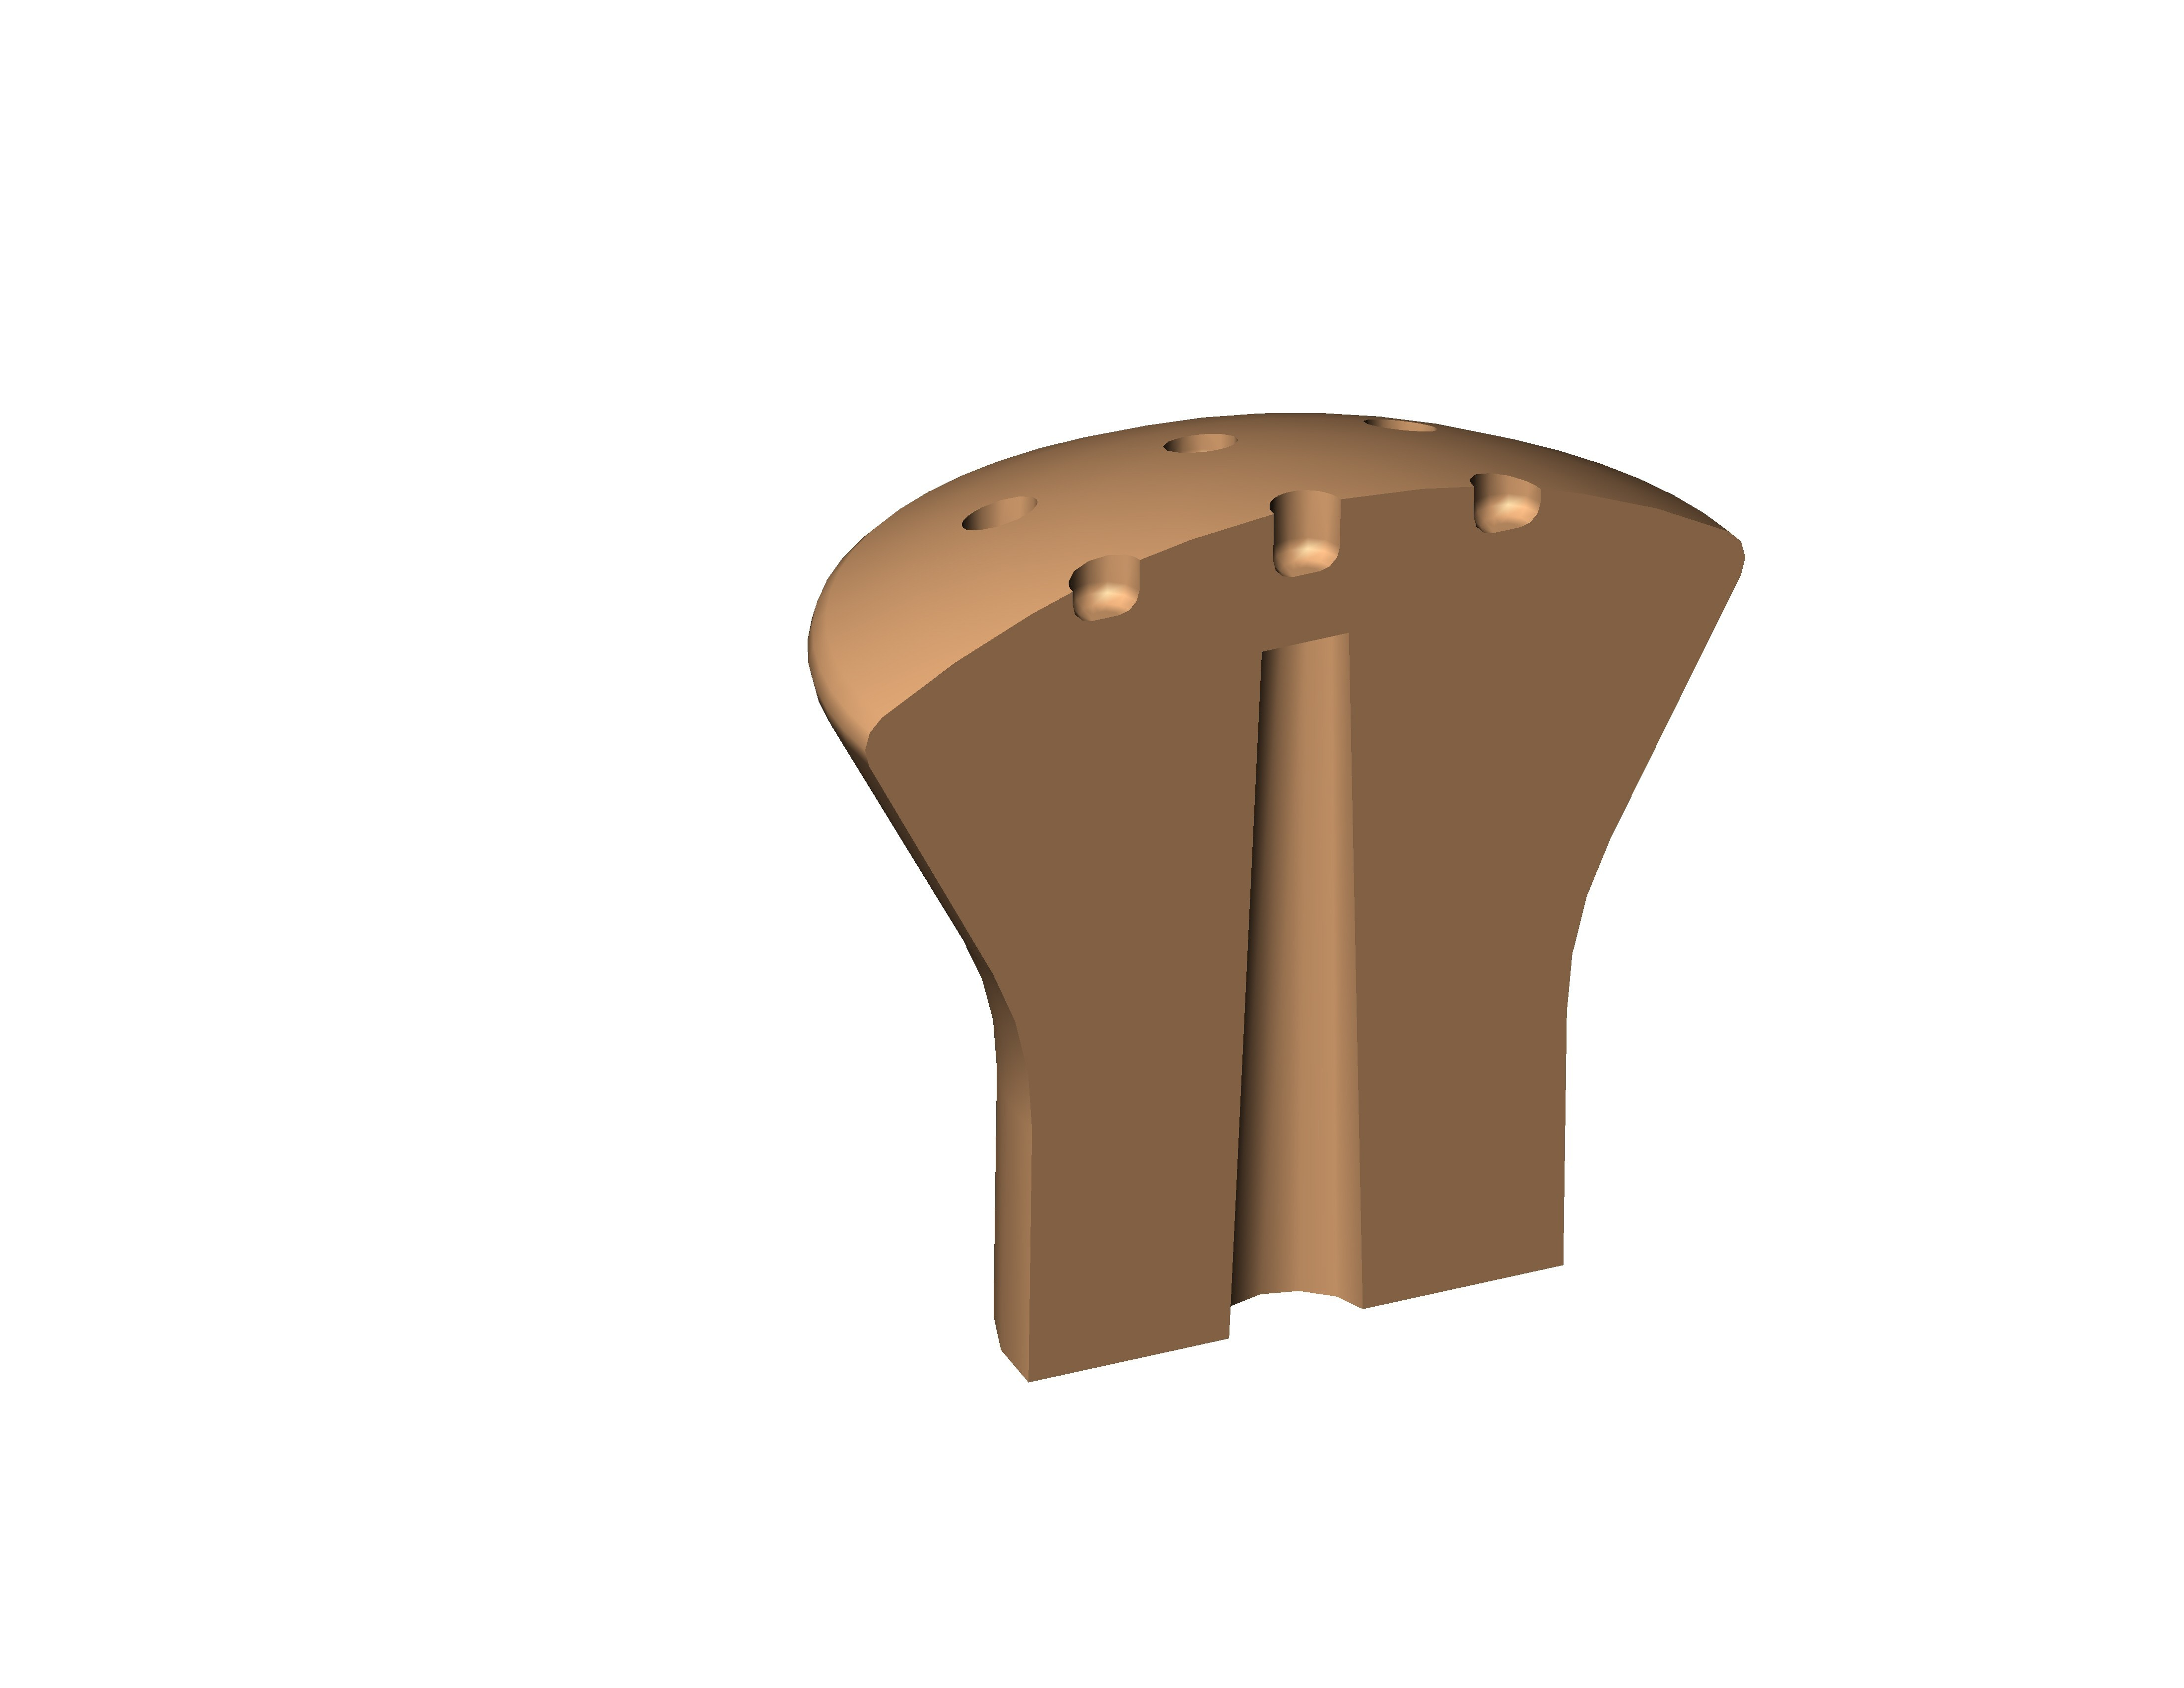 BPC d16 D27 H24 MM AD.JPG Download STL file Door Handle Knob Drawer Cabinet Door DIY Drawer • Model to 3D print, Laurence